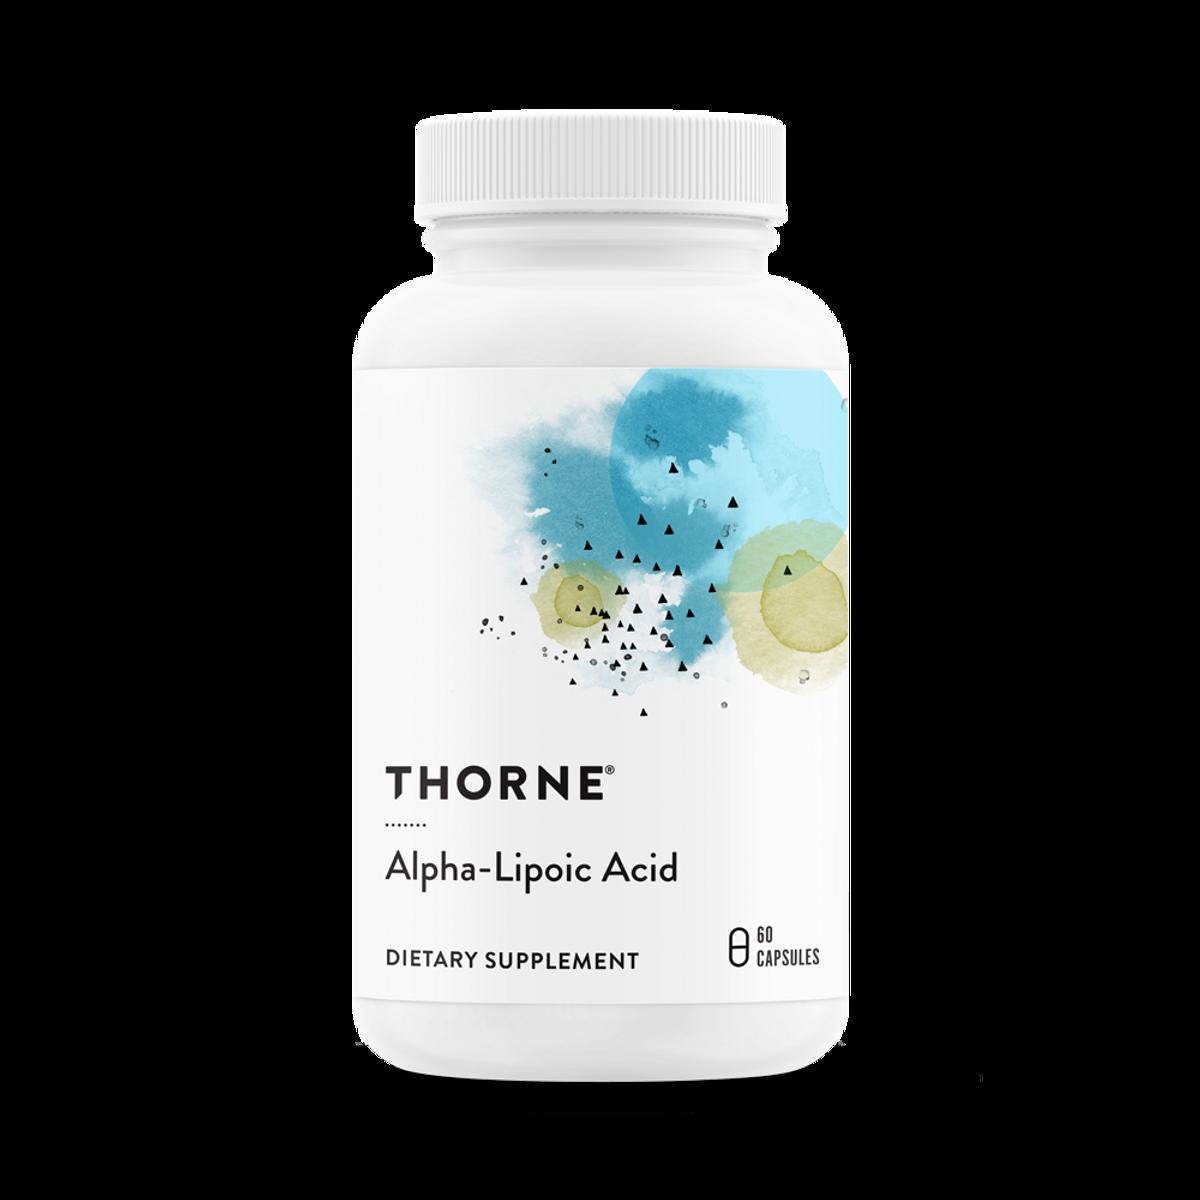 Thorne ALA Alfa Liponsyre